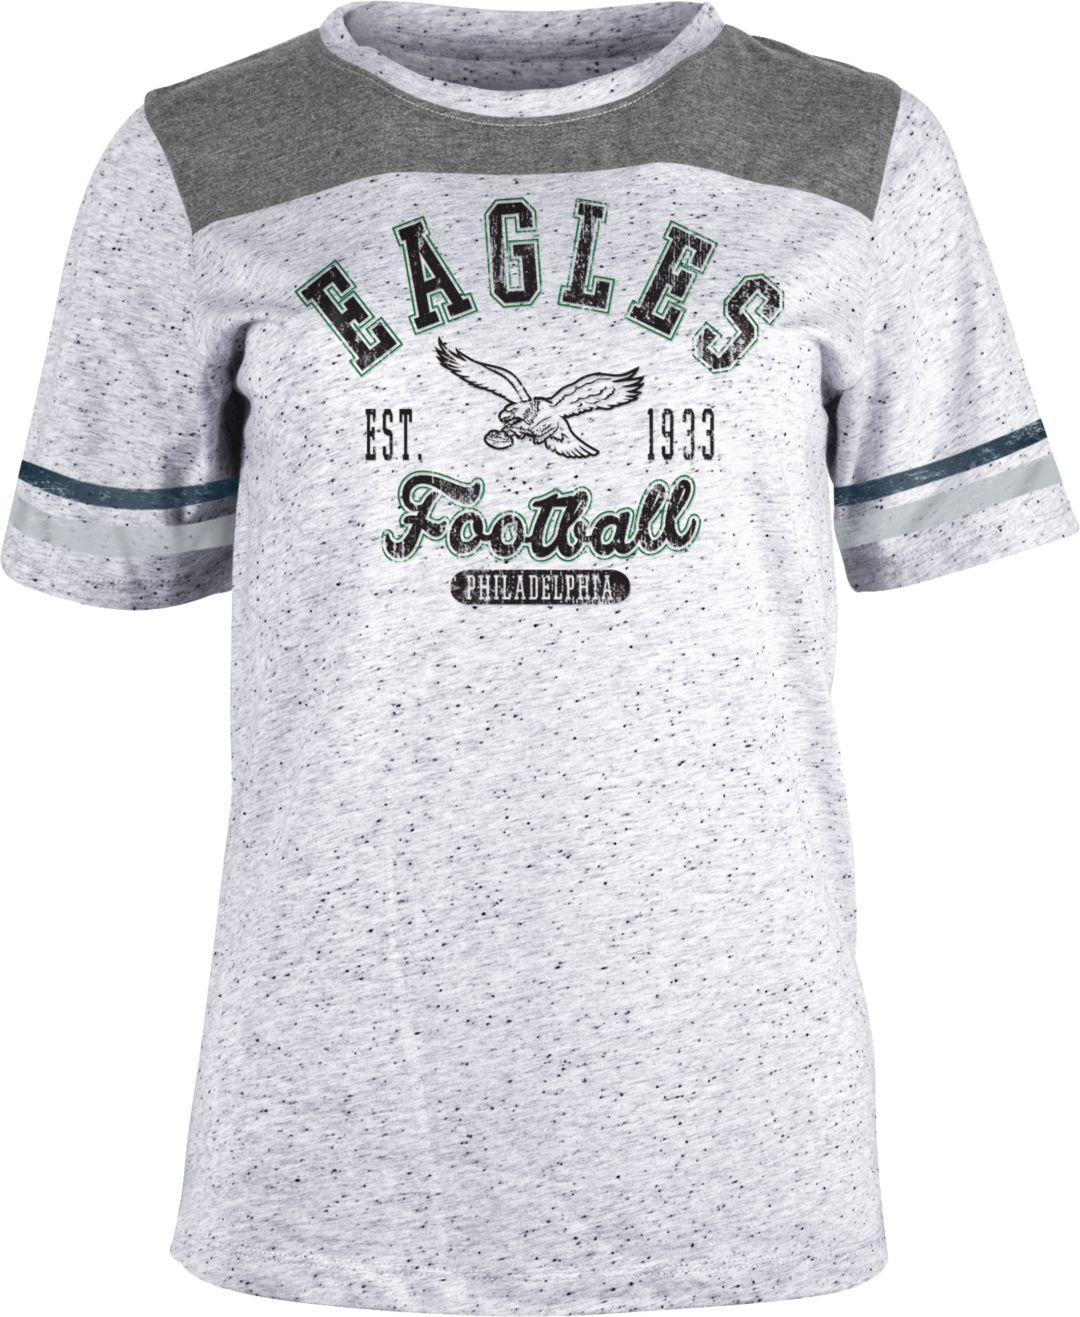 0b7014d6 NFL Team Apparel Women's Philadelphia Eagles Peppercorn T-Shirt